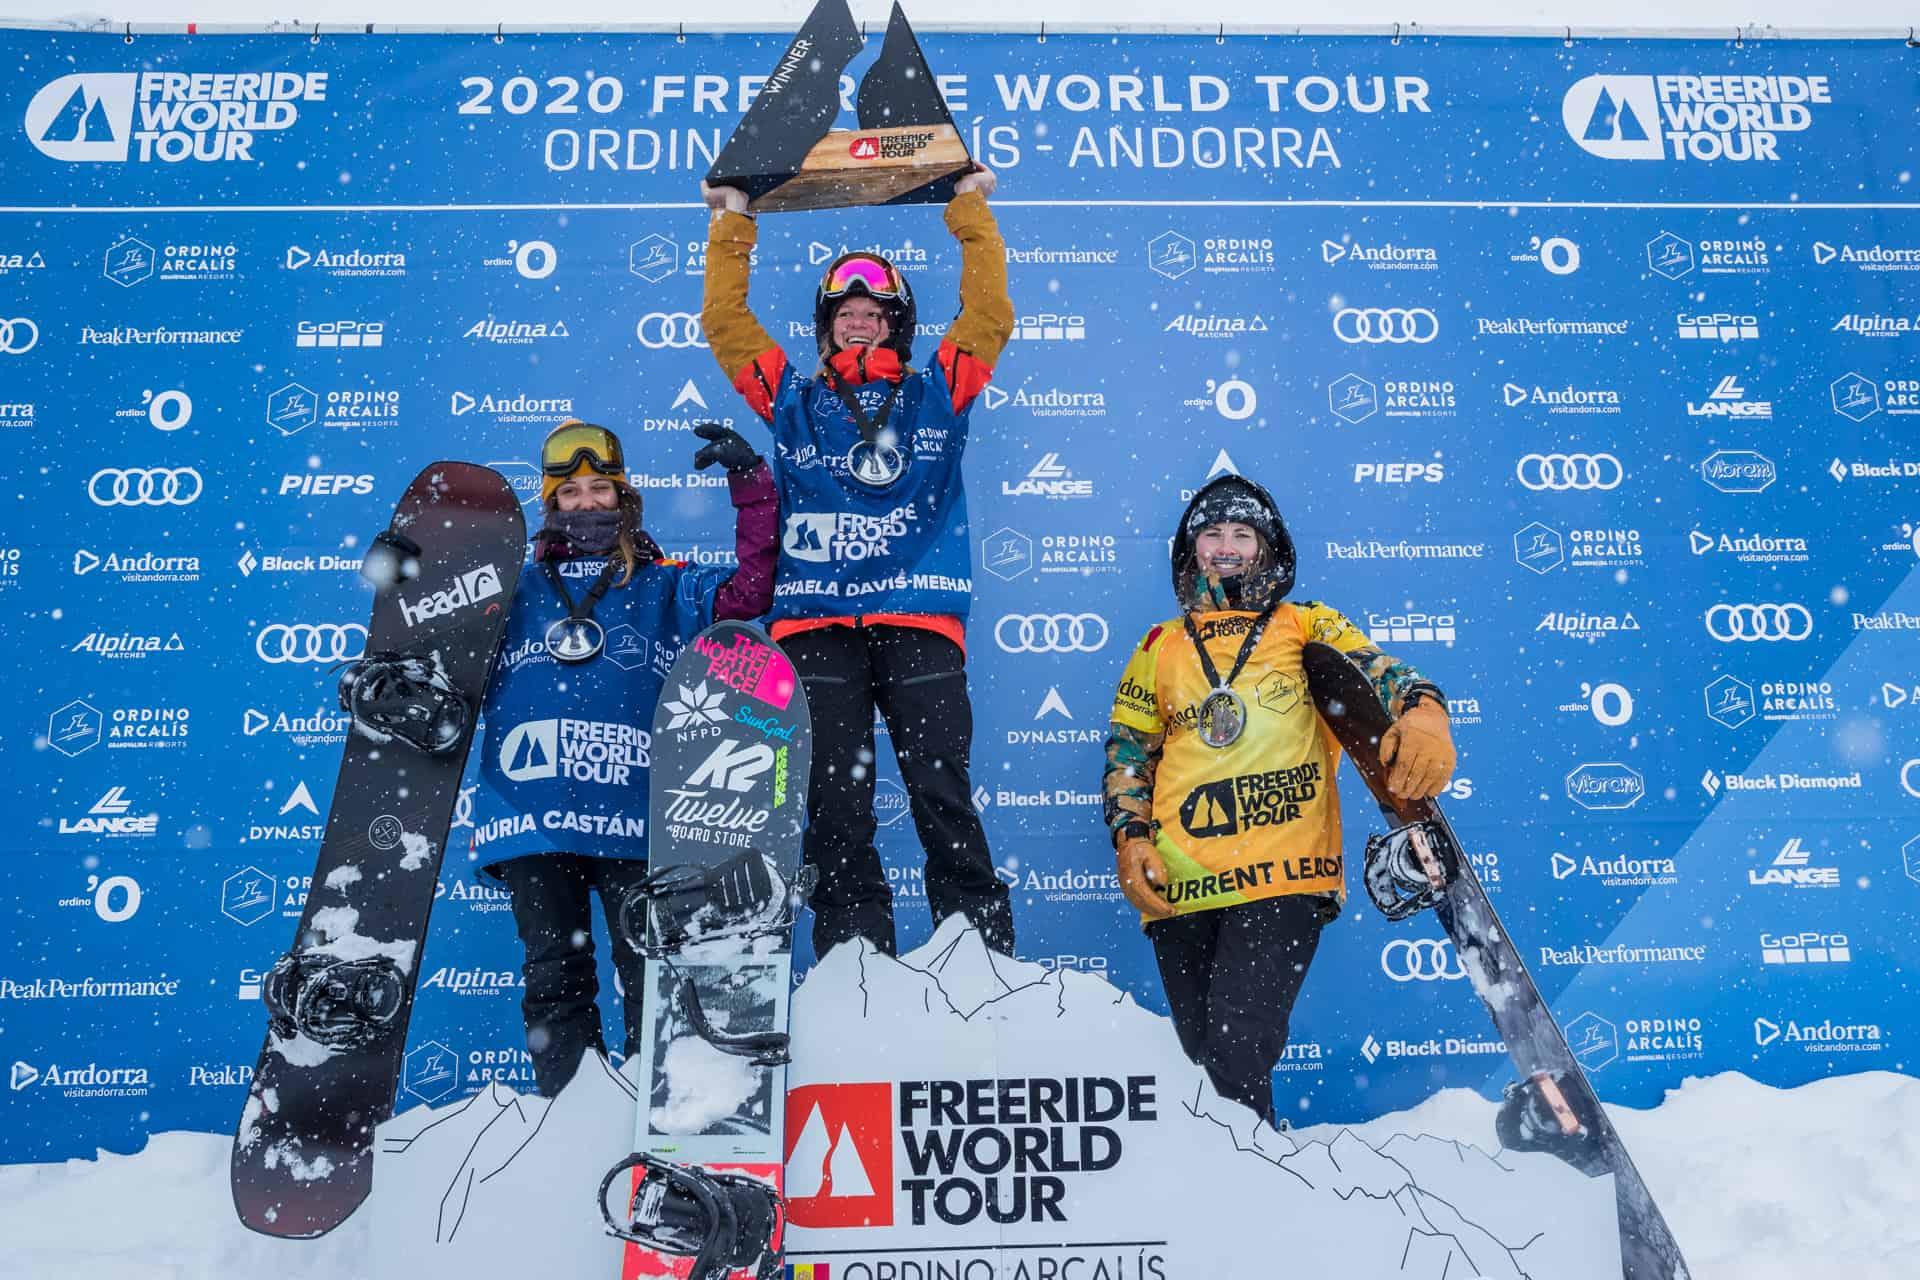 Freeride World Tour, Andorra - Australia's Michaela Davis-Meehan Wins Women's Snowboard